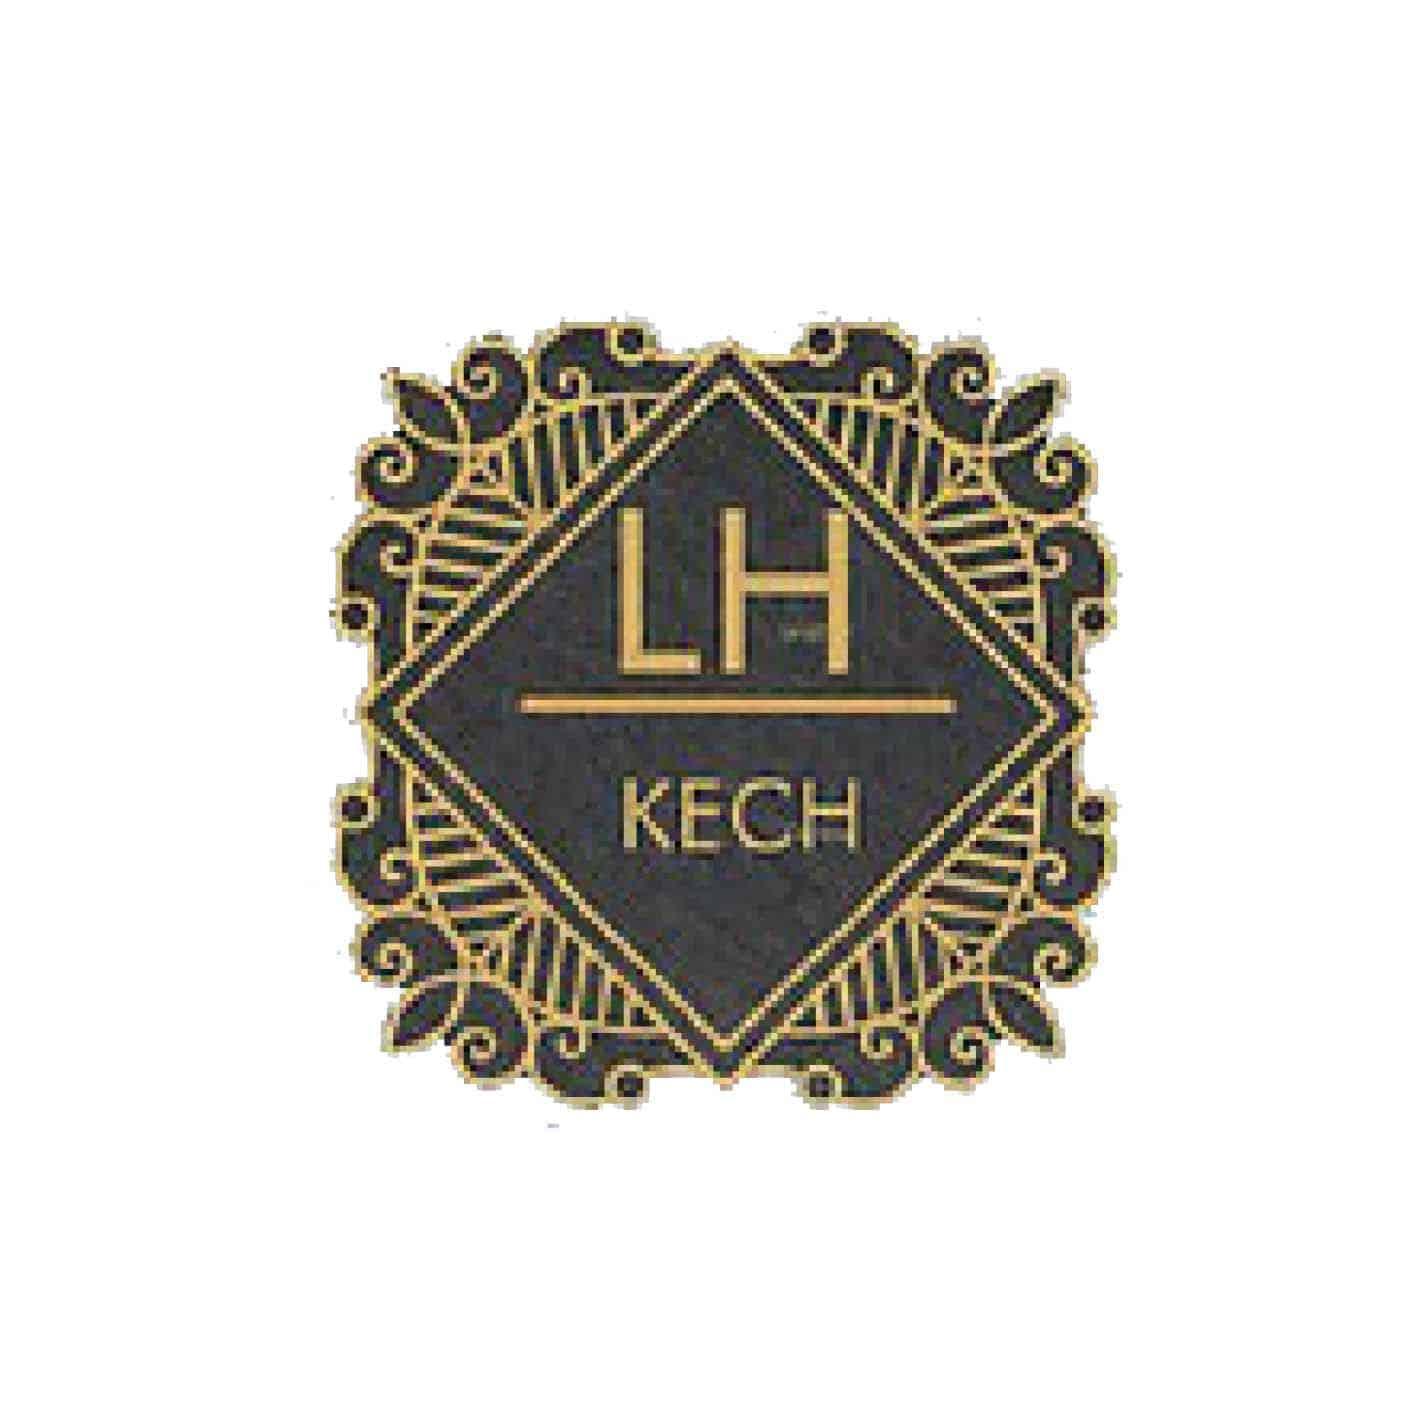 1964-communication-le-havre-logo-lh-kech